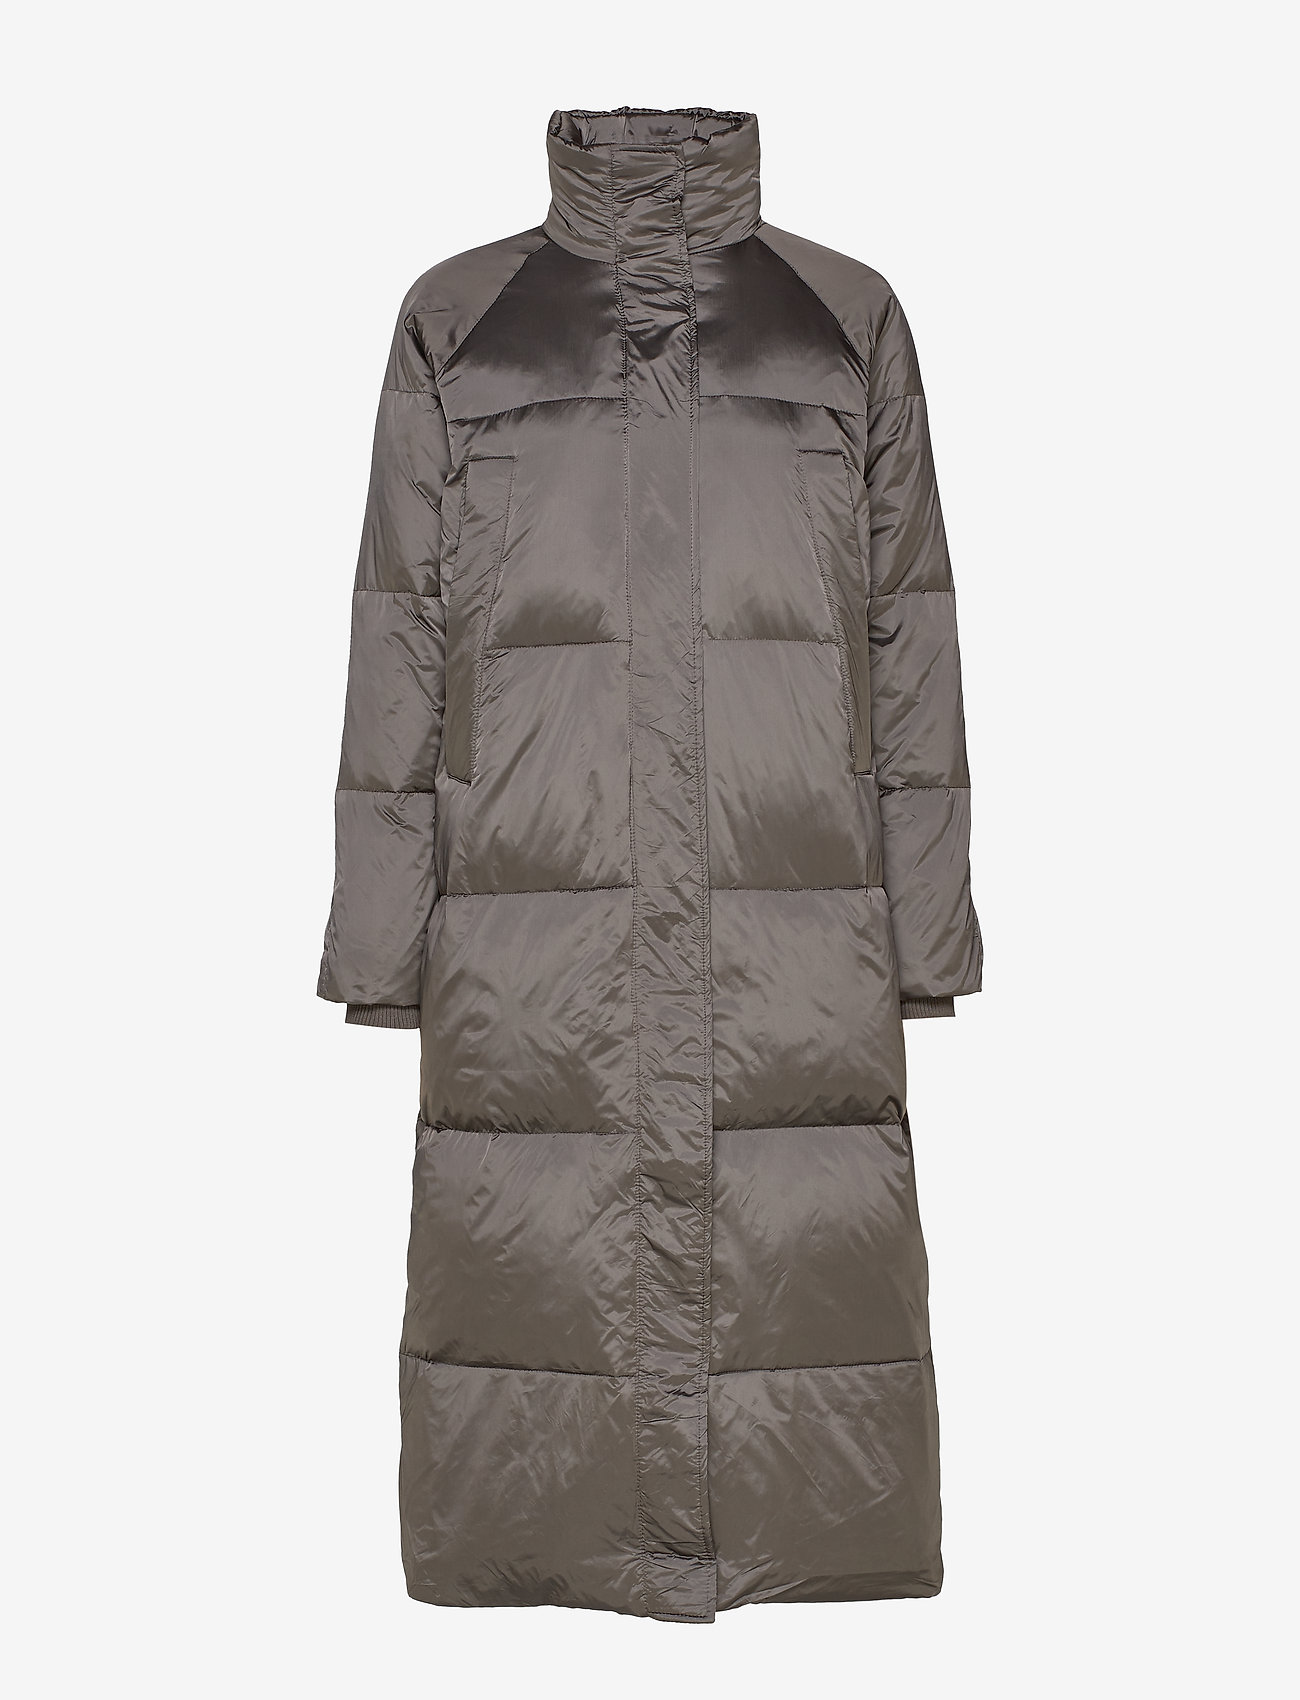 Zayraiw Long Coat (Nine Iron) (1680 kr) - InWear